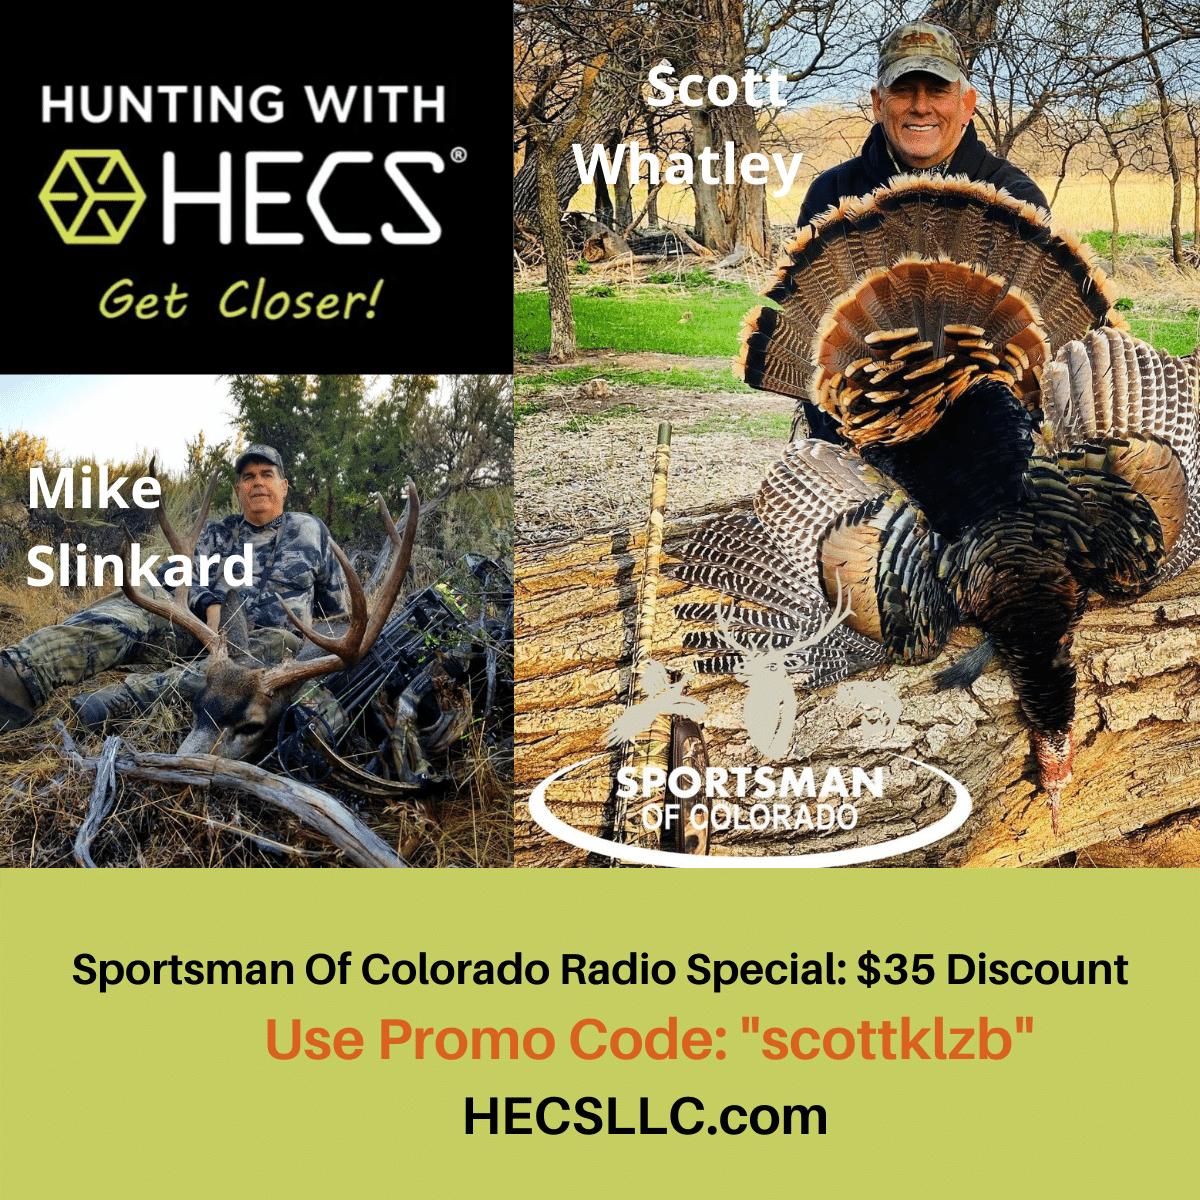 June 19, 2021: Mike Slinkard of HECS – Phoenix Weaponry – Lone Star Hunts